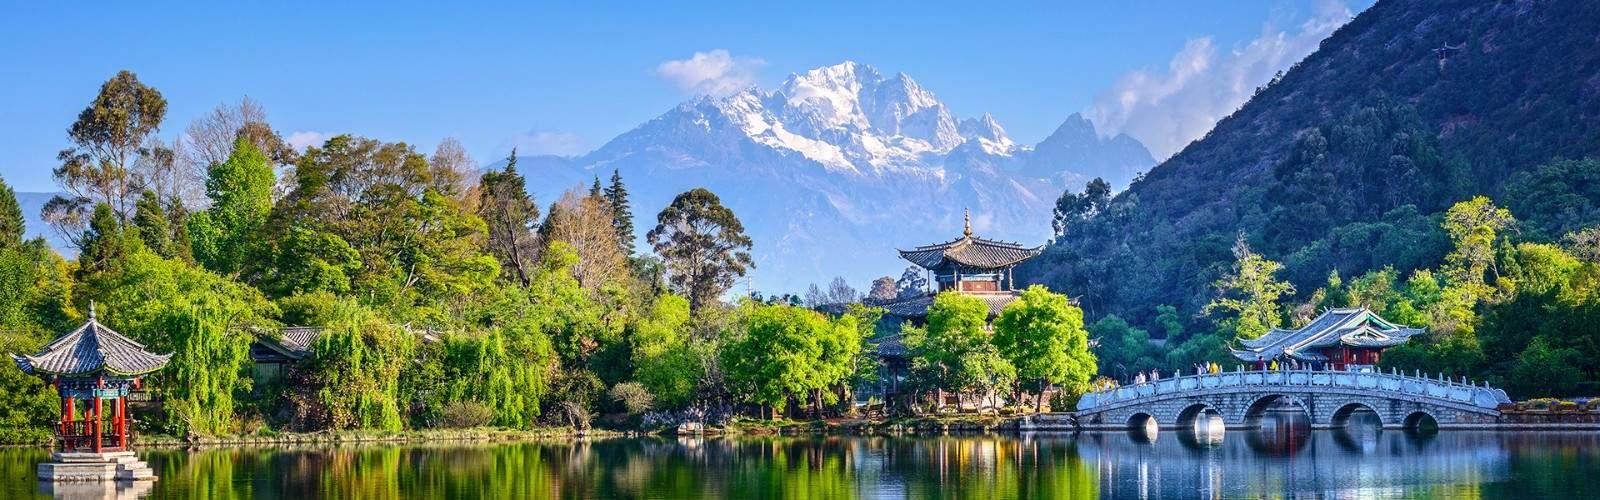 Classic China China Tour Wendy Wu Tours - China tour